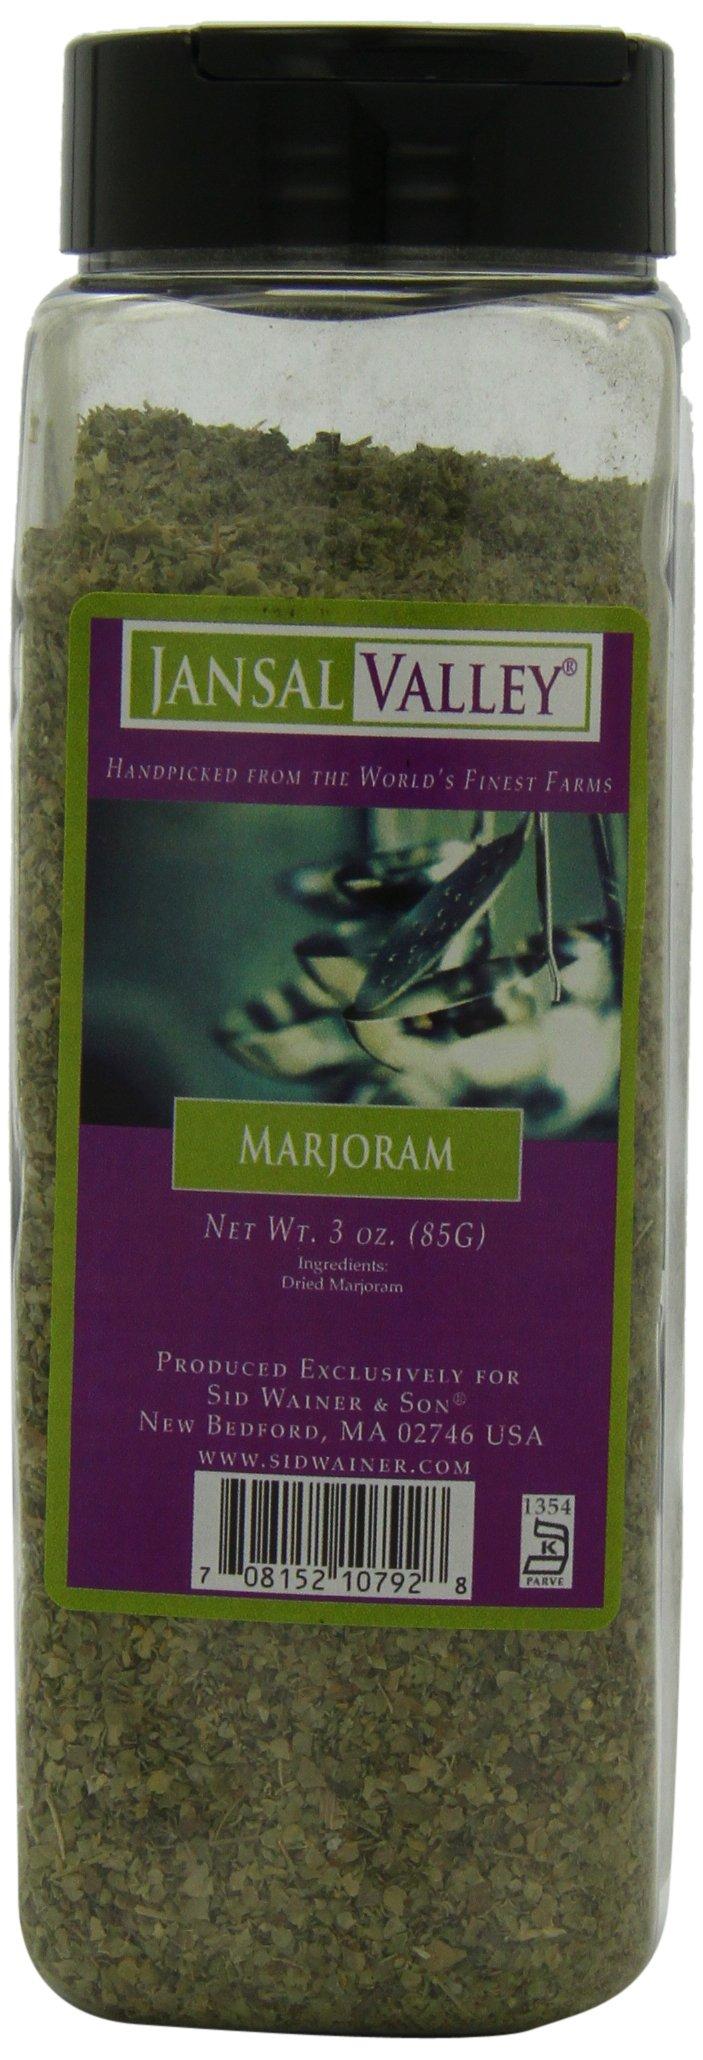 Jansal Valley Marjoram, 3 Ounce